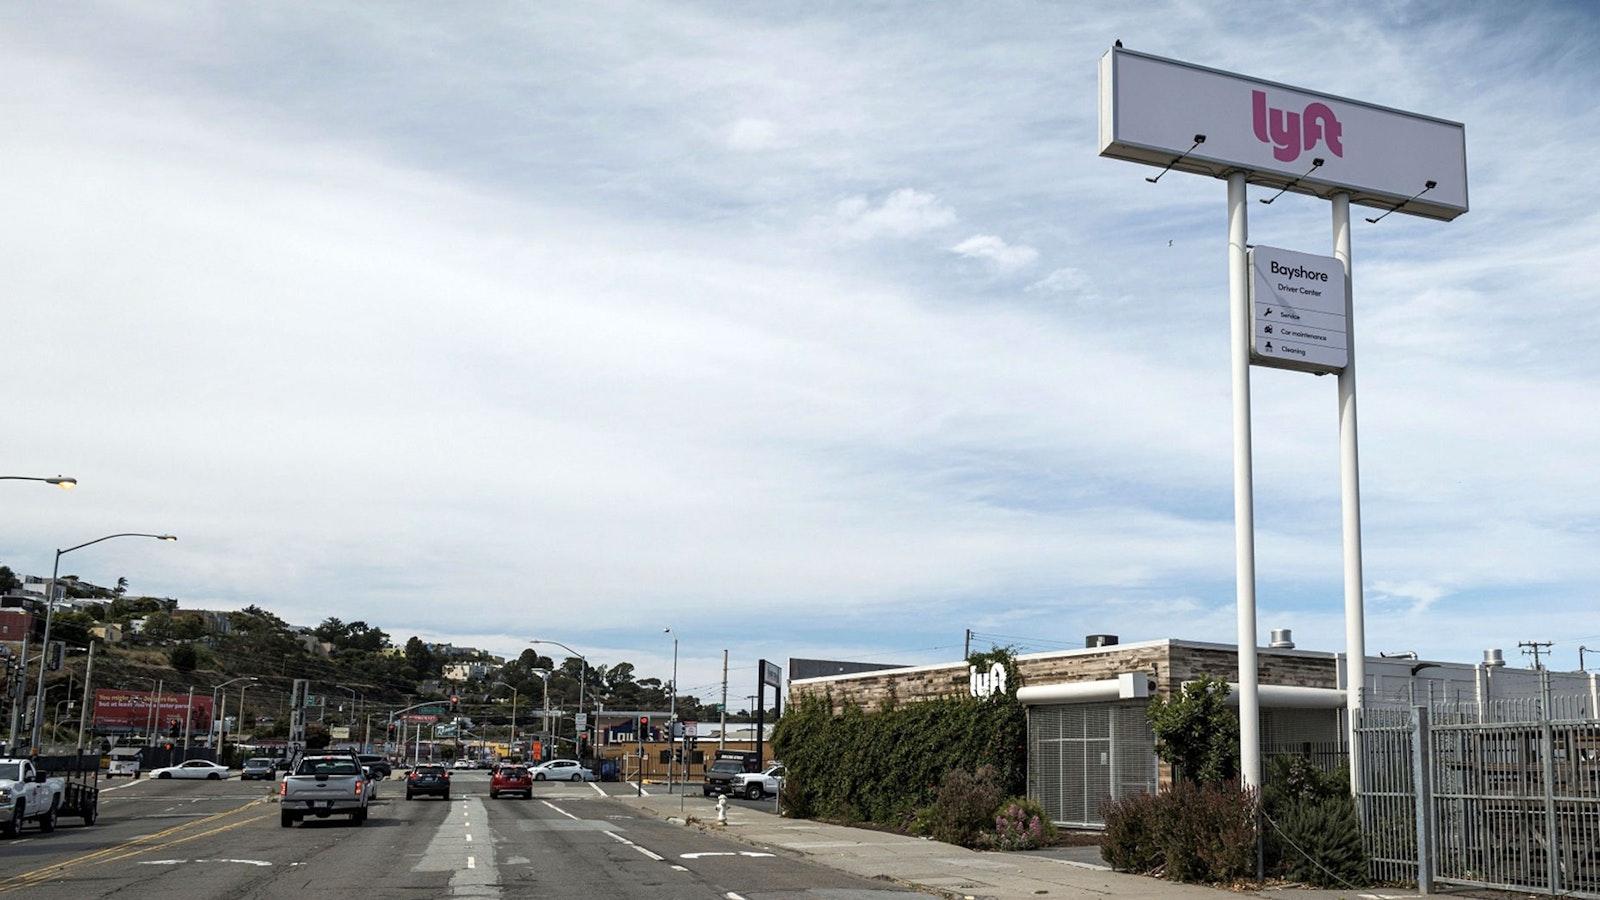 Lyft's San Francisco driver hub. Photo by Bloomberg.